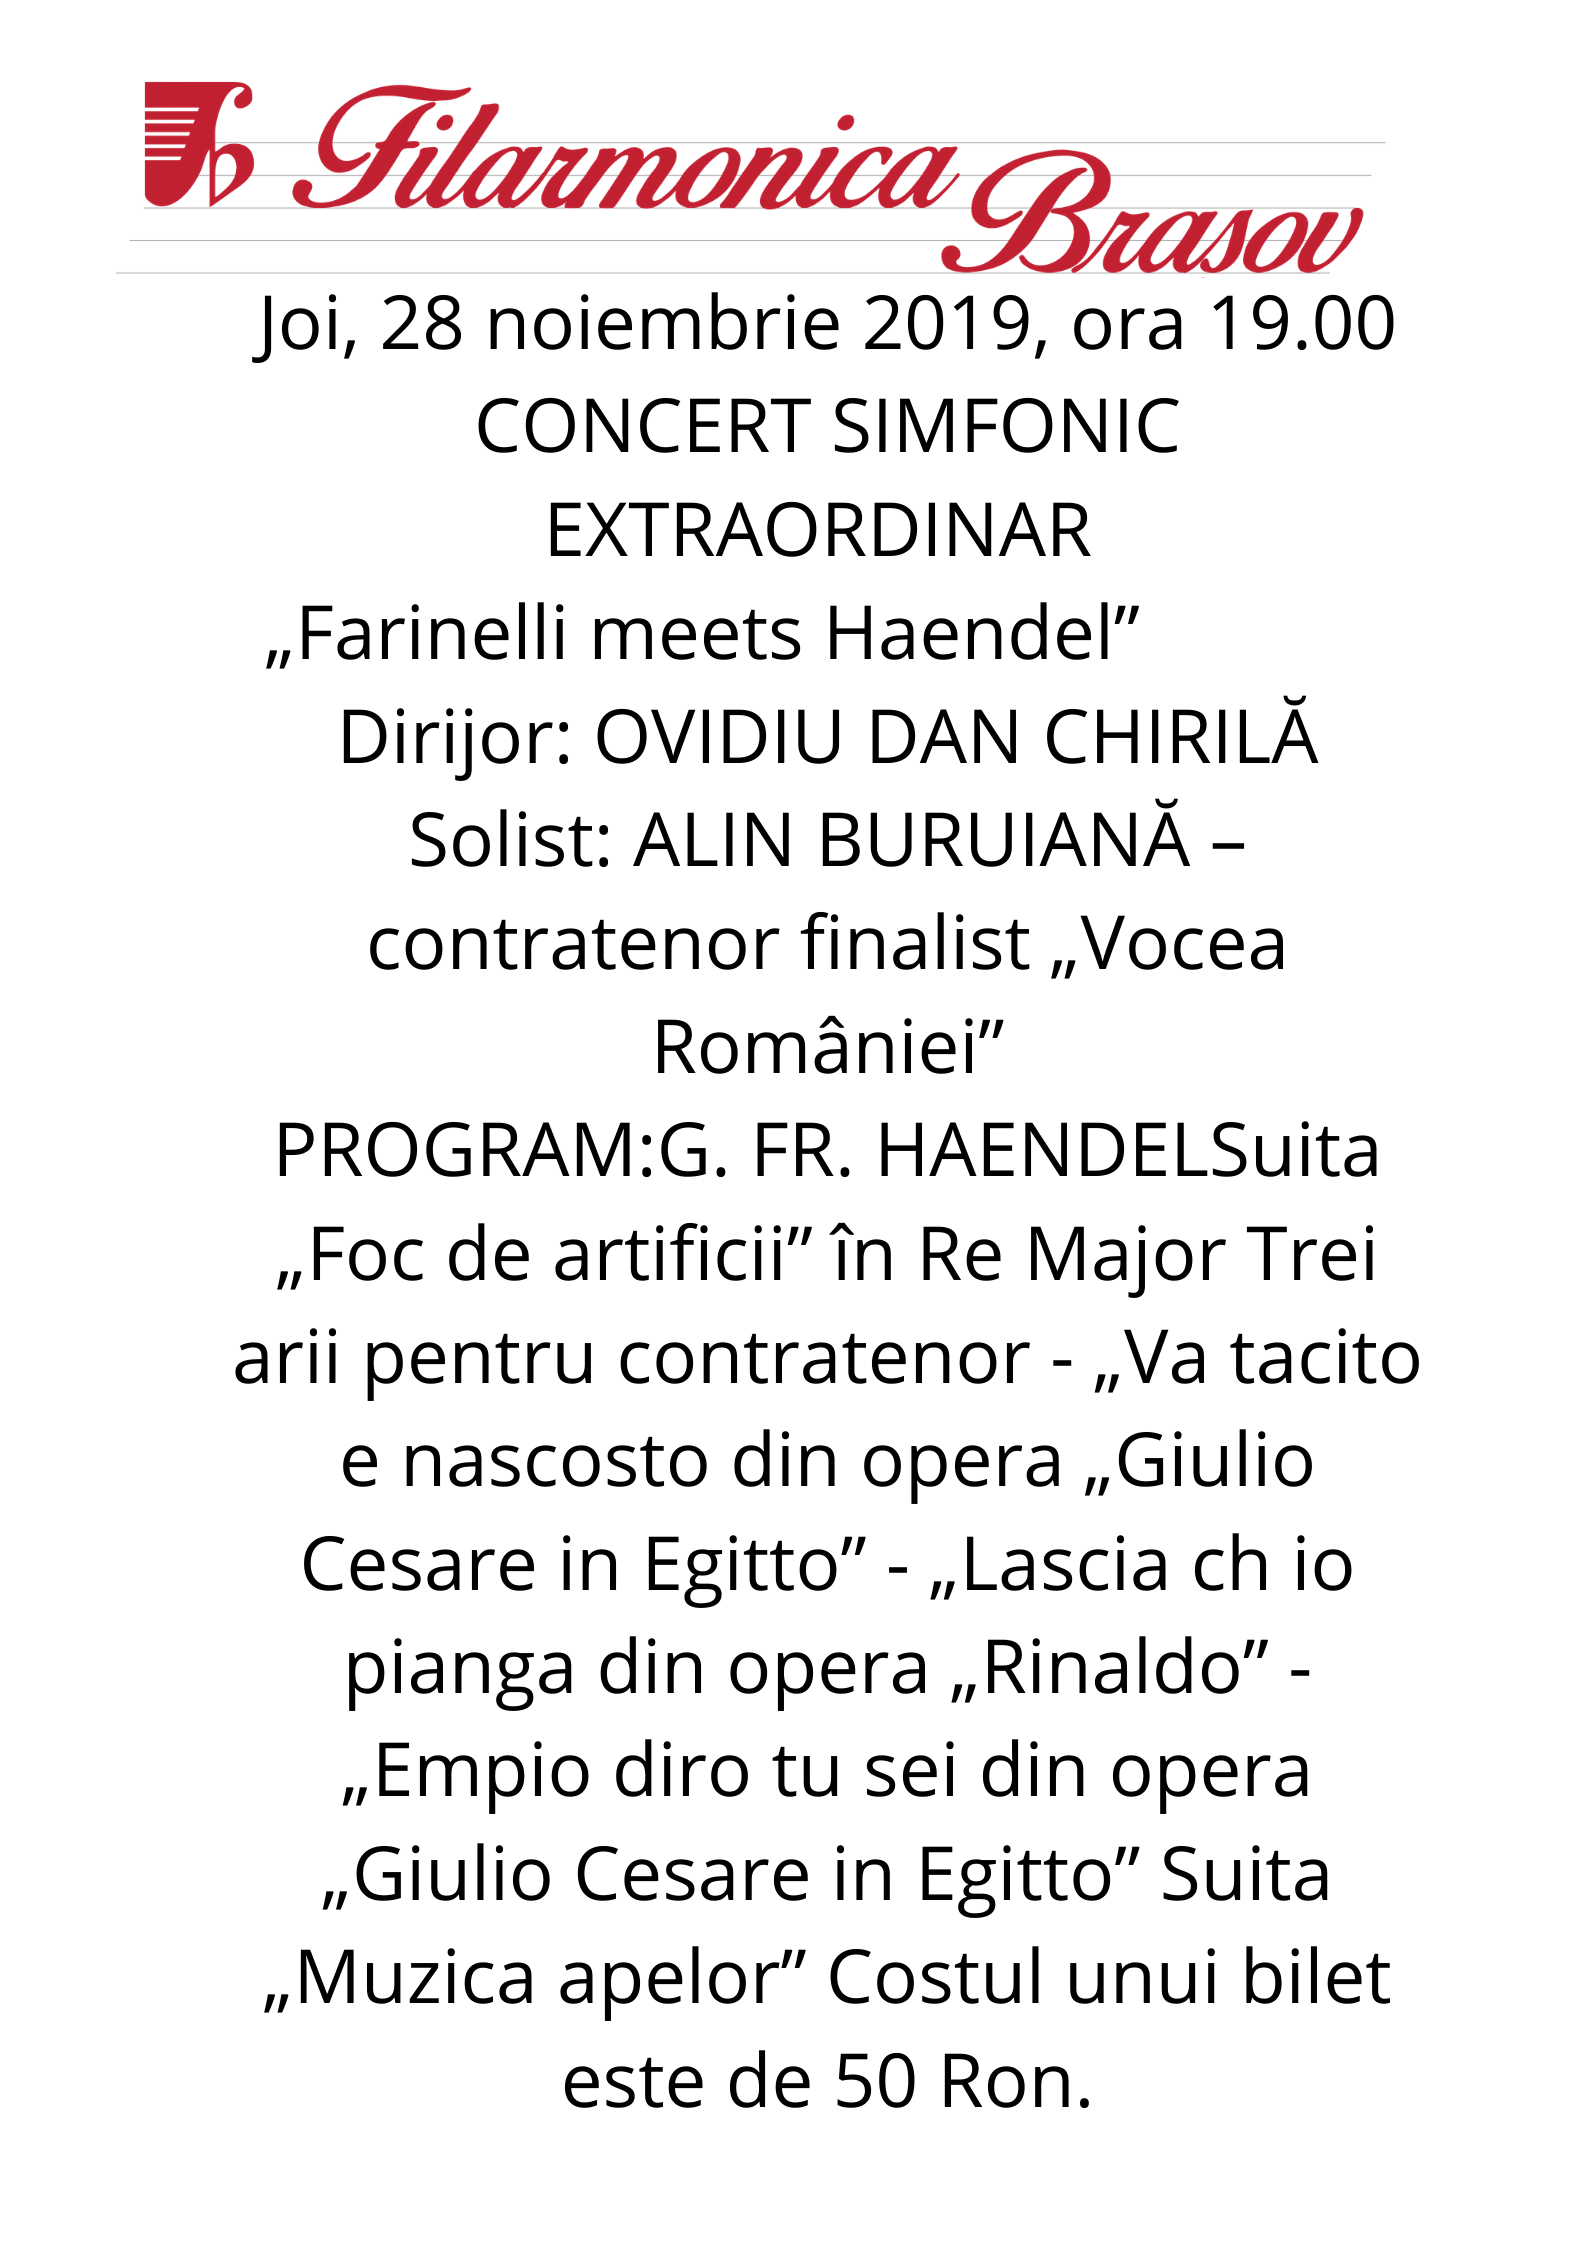 FILARMONICA BRASOV | CONCERT SIMFONIC EXTRAORDINAR | Farinelli meets Haendel